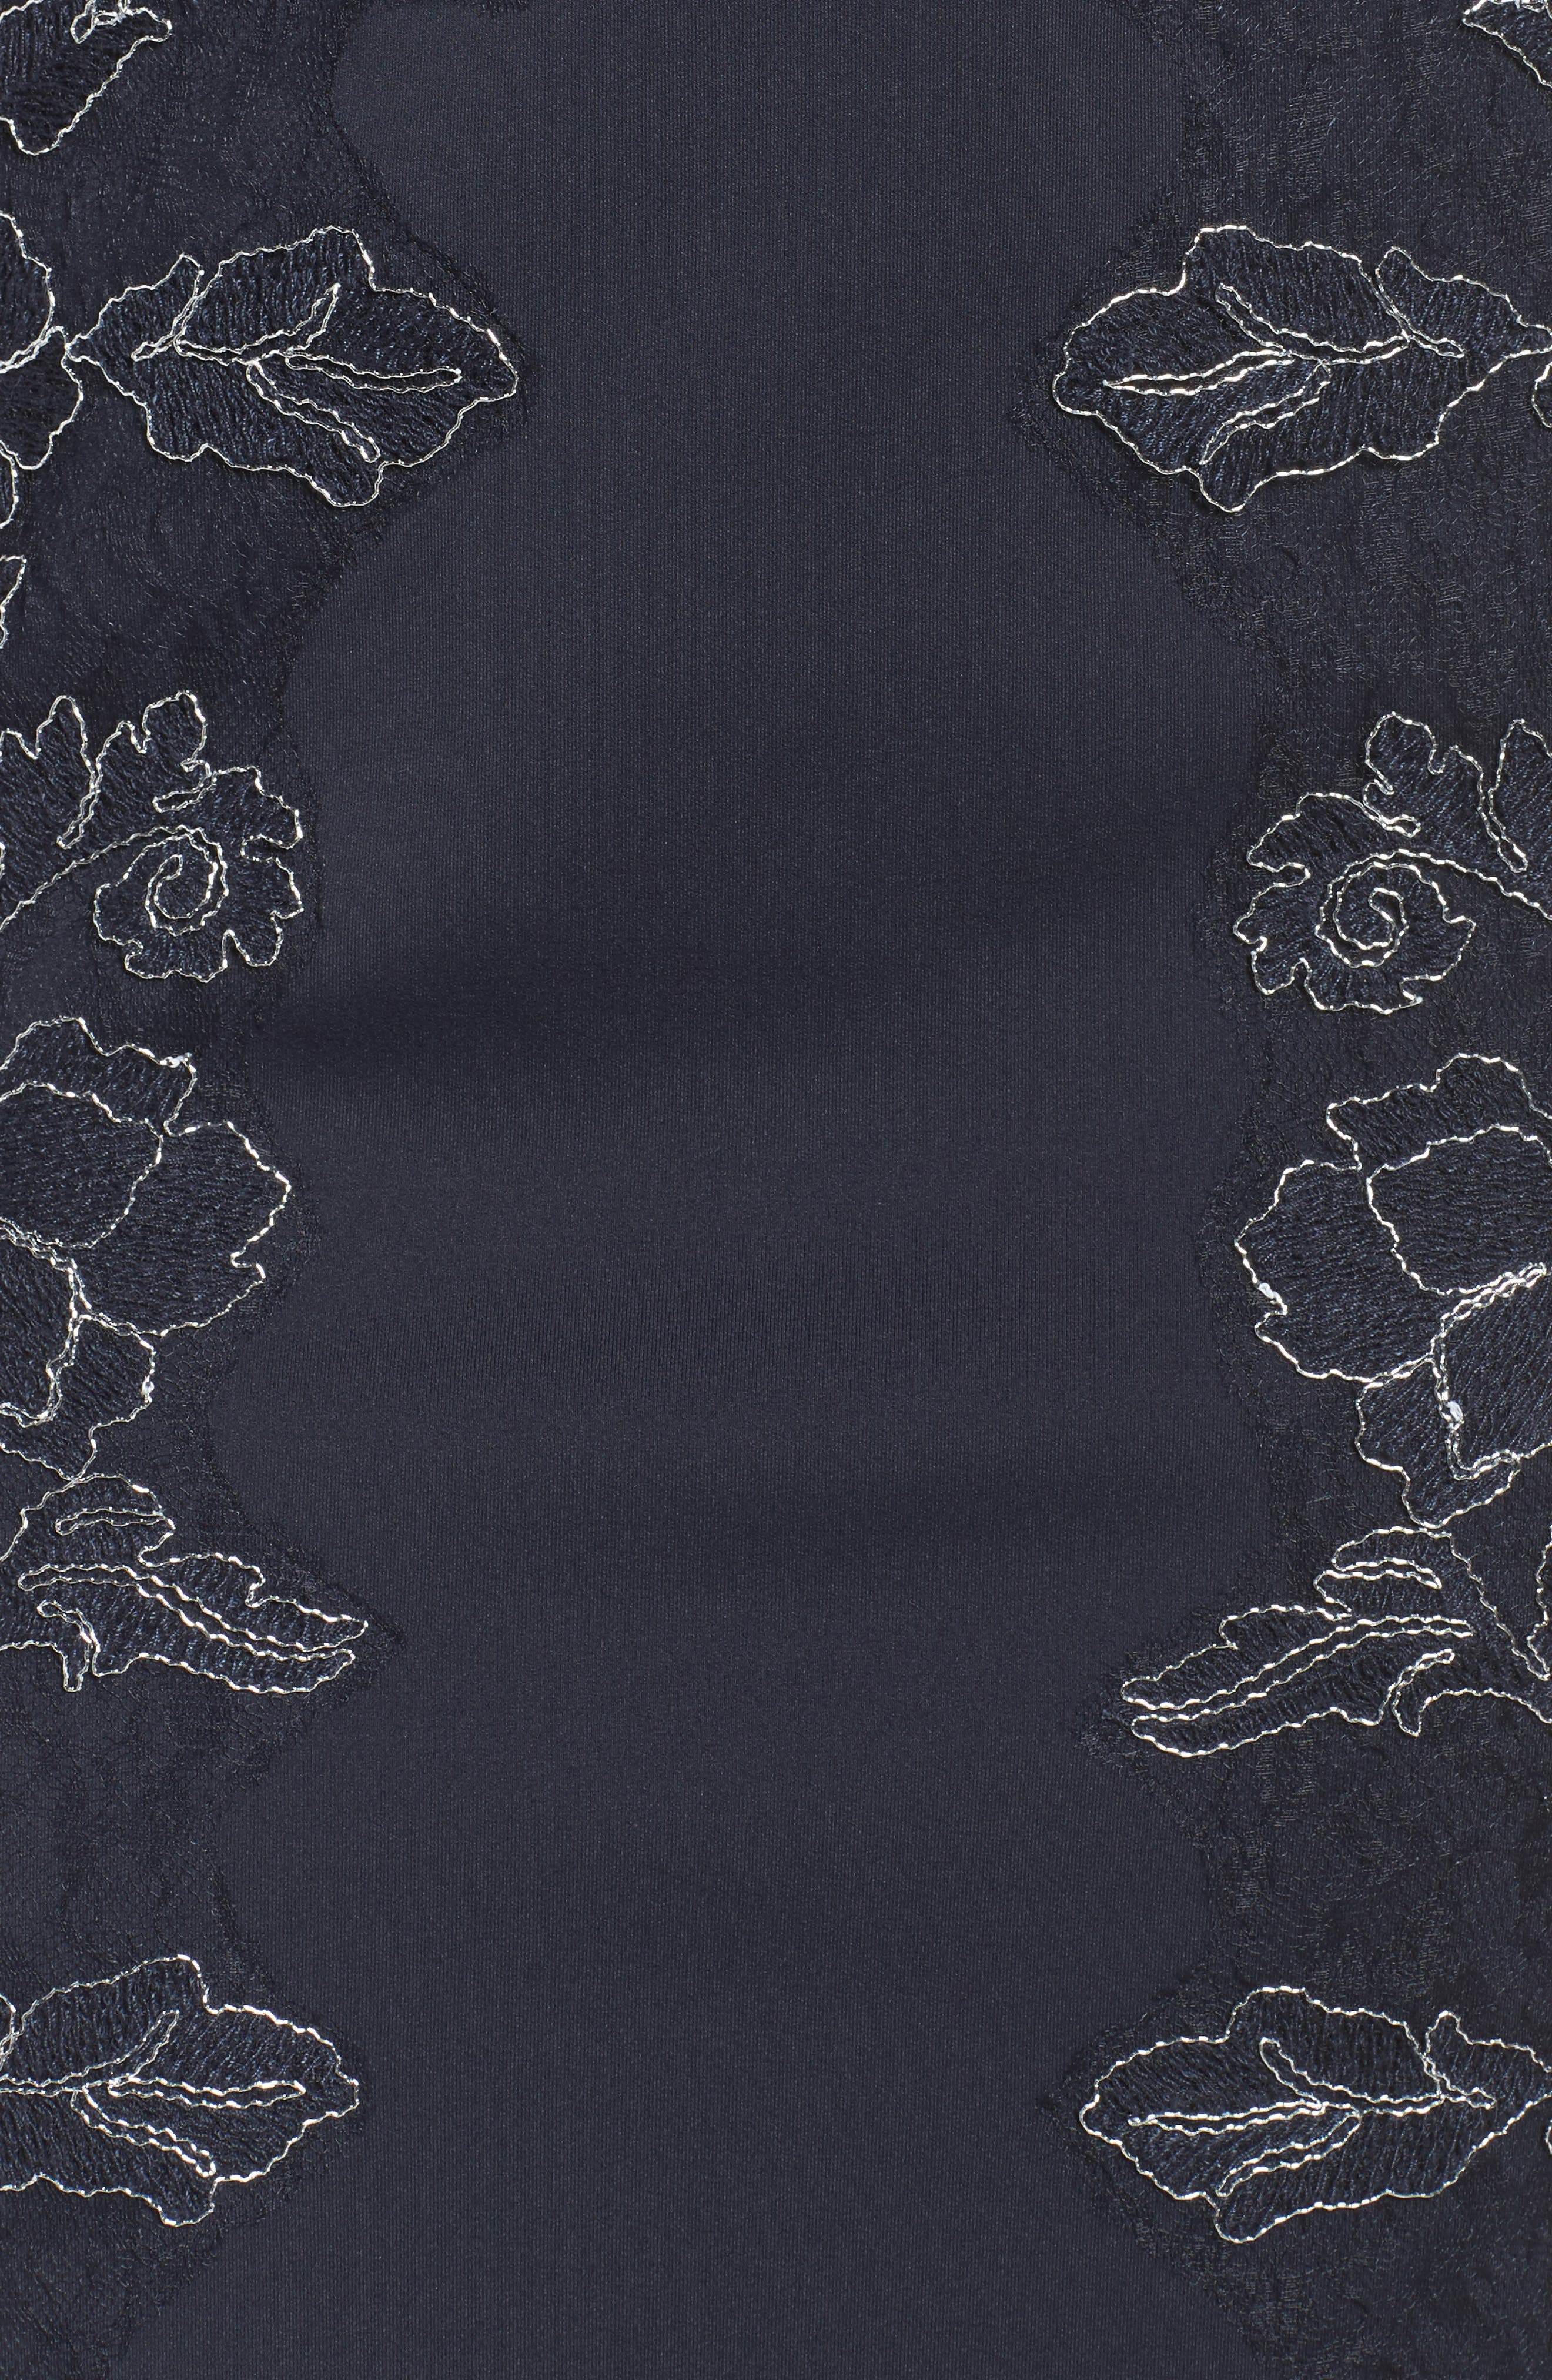 Embroidered Neoprene Sheath Dress,                             Alternate thumbnail 18, color,